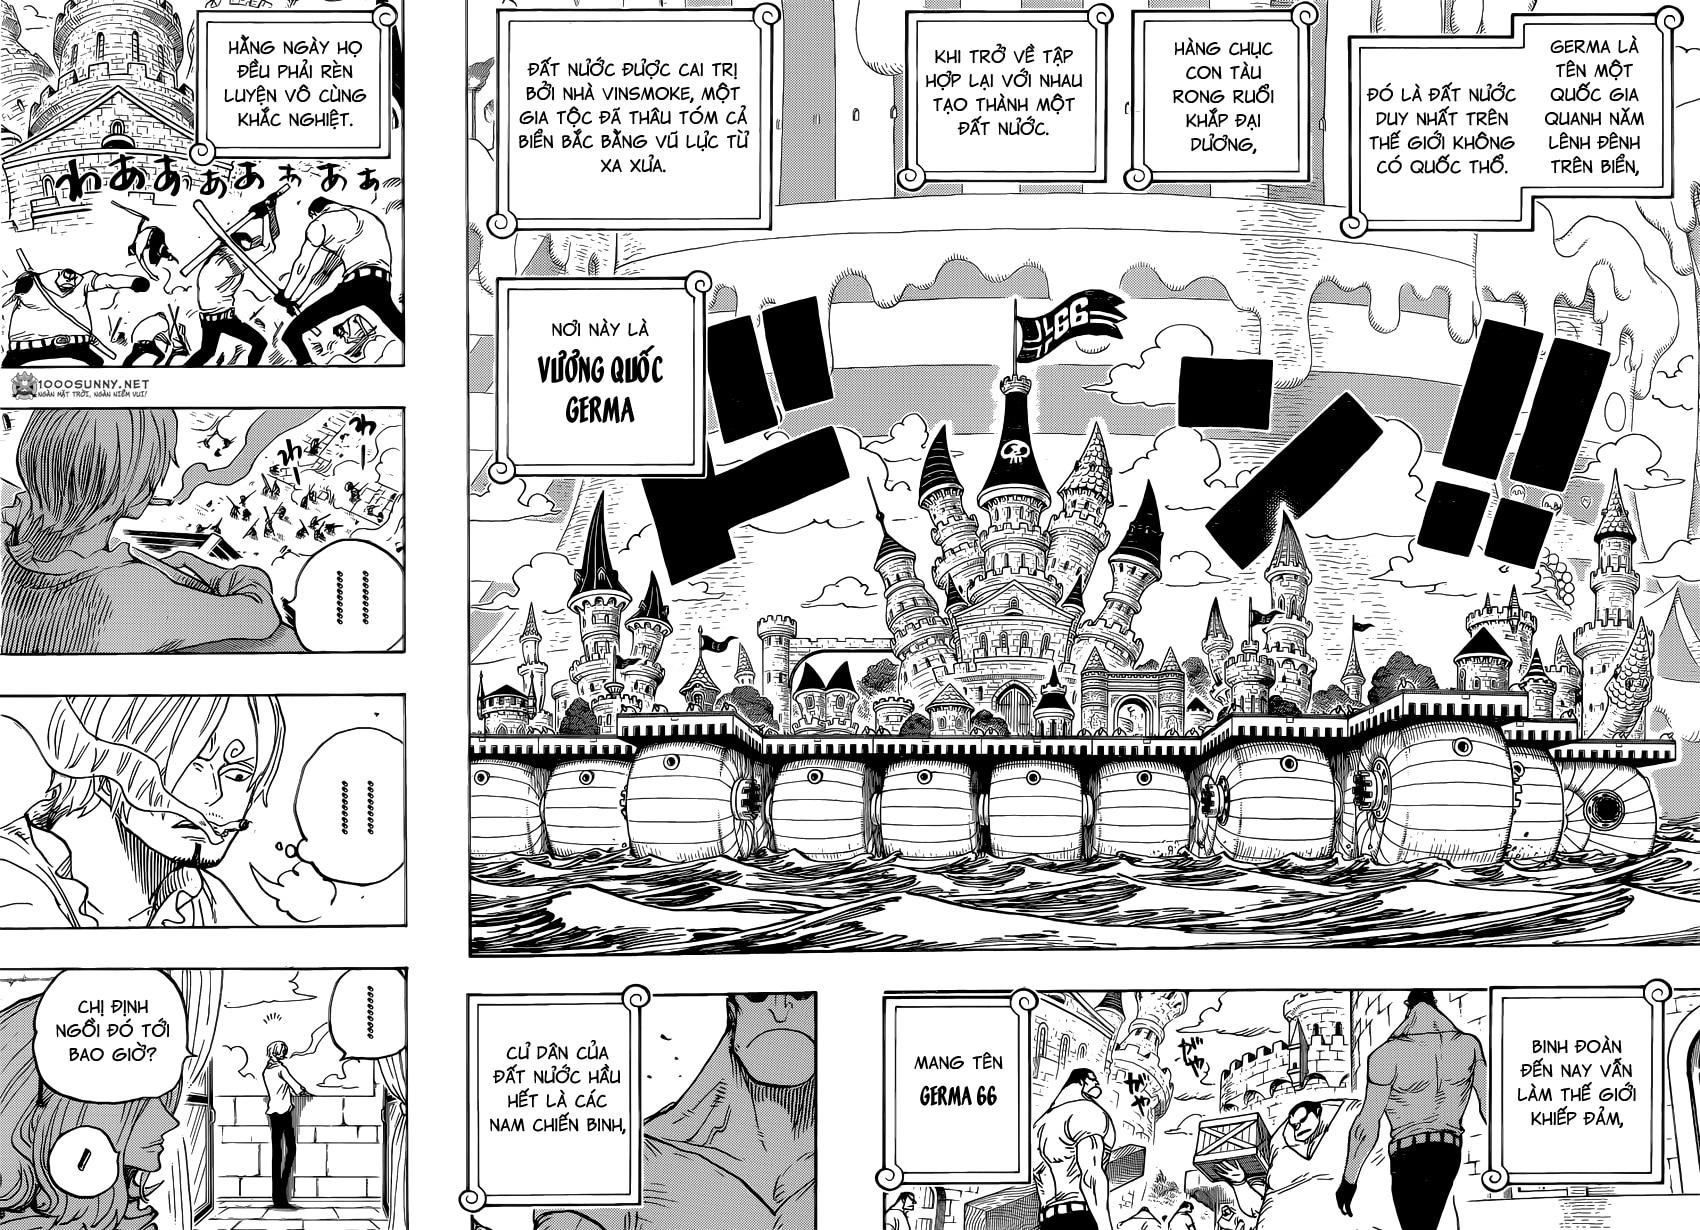 One Piece Chapter 832: Vương quốc Germa 012_013